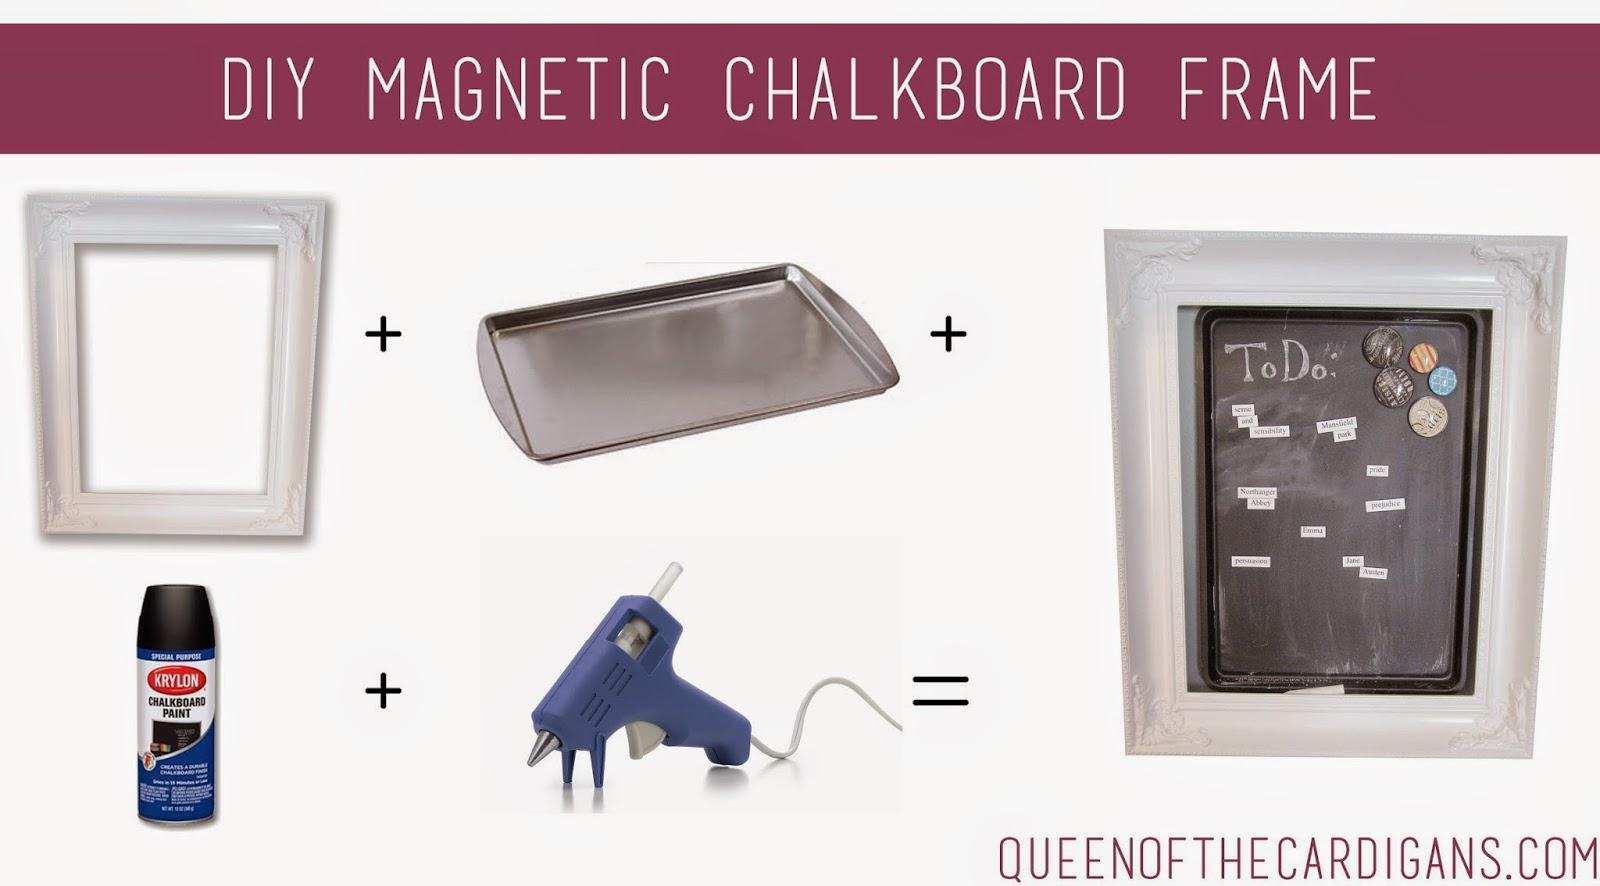 Queen of the Cardigans: DIY Magnetic Chalkboard Tutorial